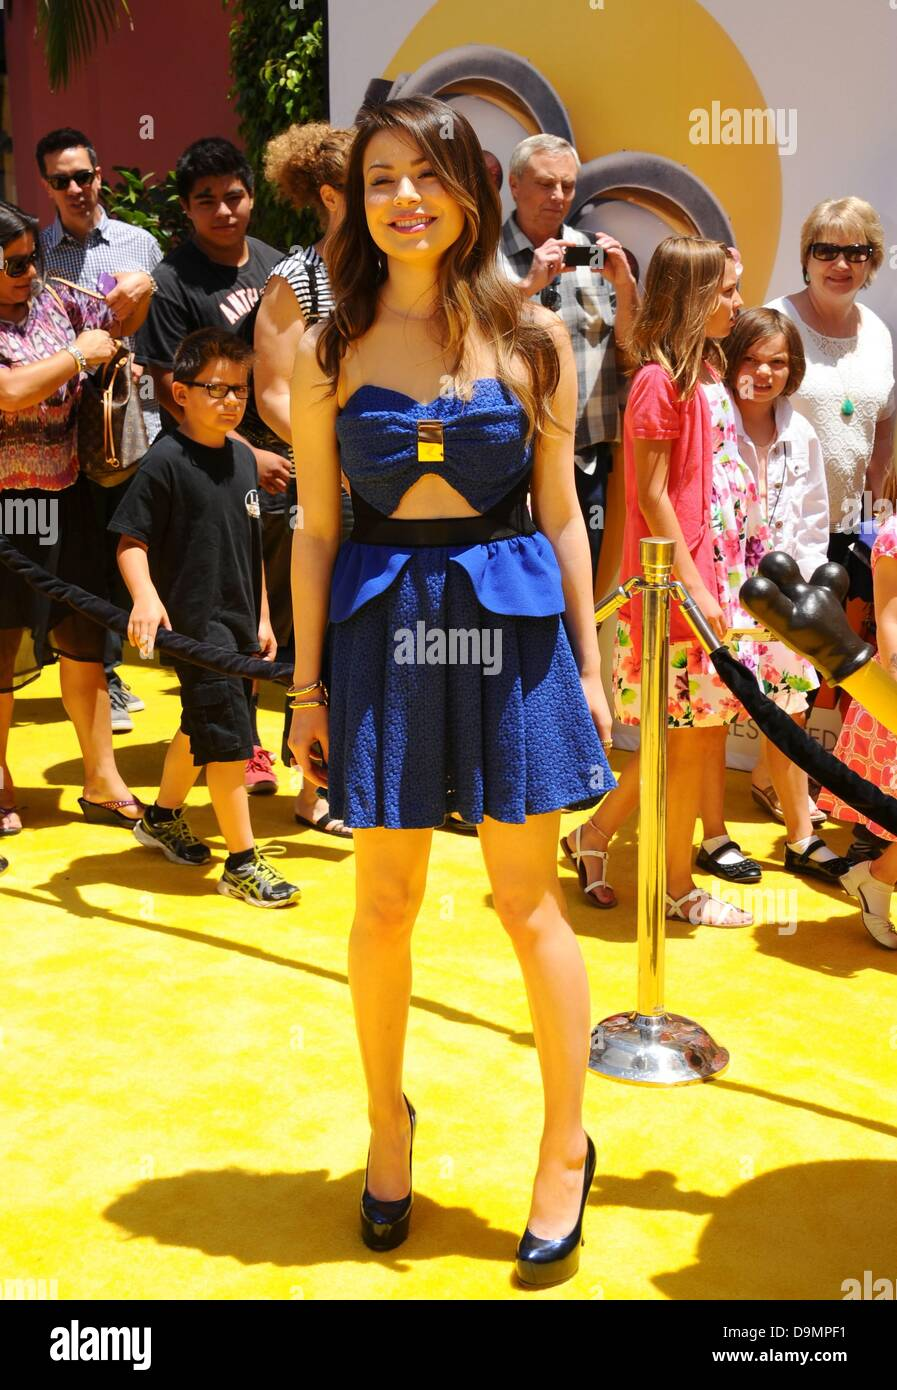 Los Angeles, CA, US. 22 June 2013. Miranda Cosgrove at arrivals for DESPICABLE ME 2 Premiere, Universal City Walk - Stock Image